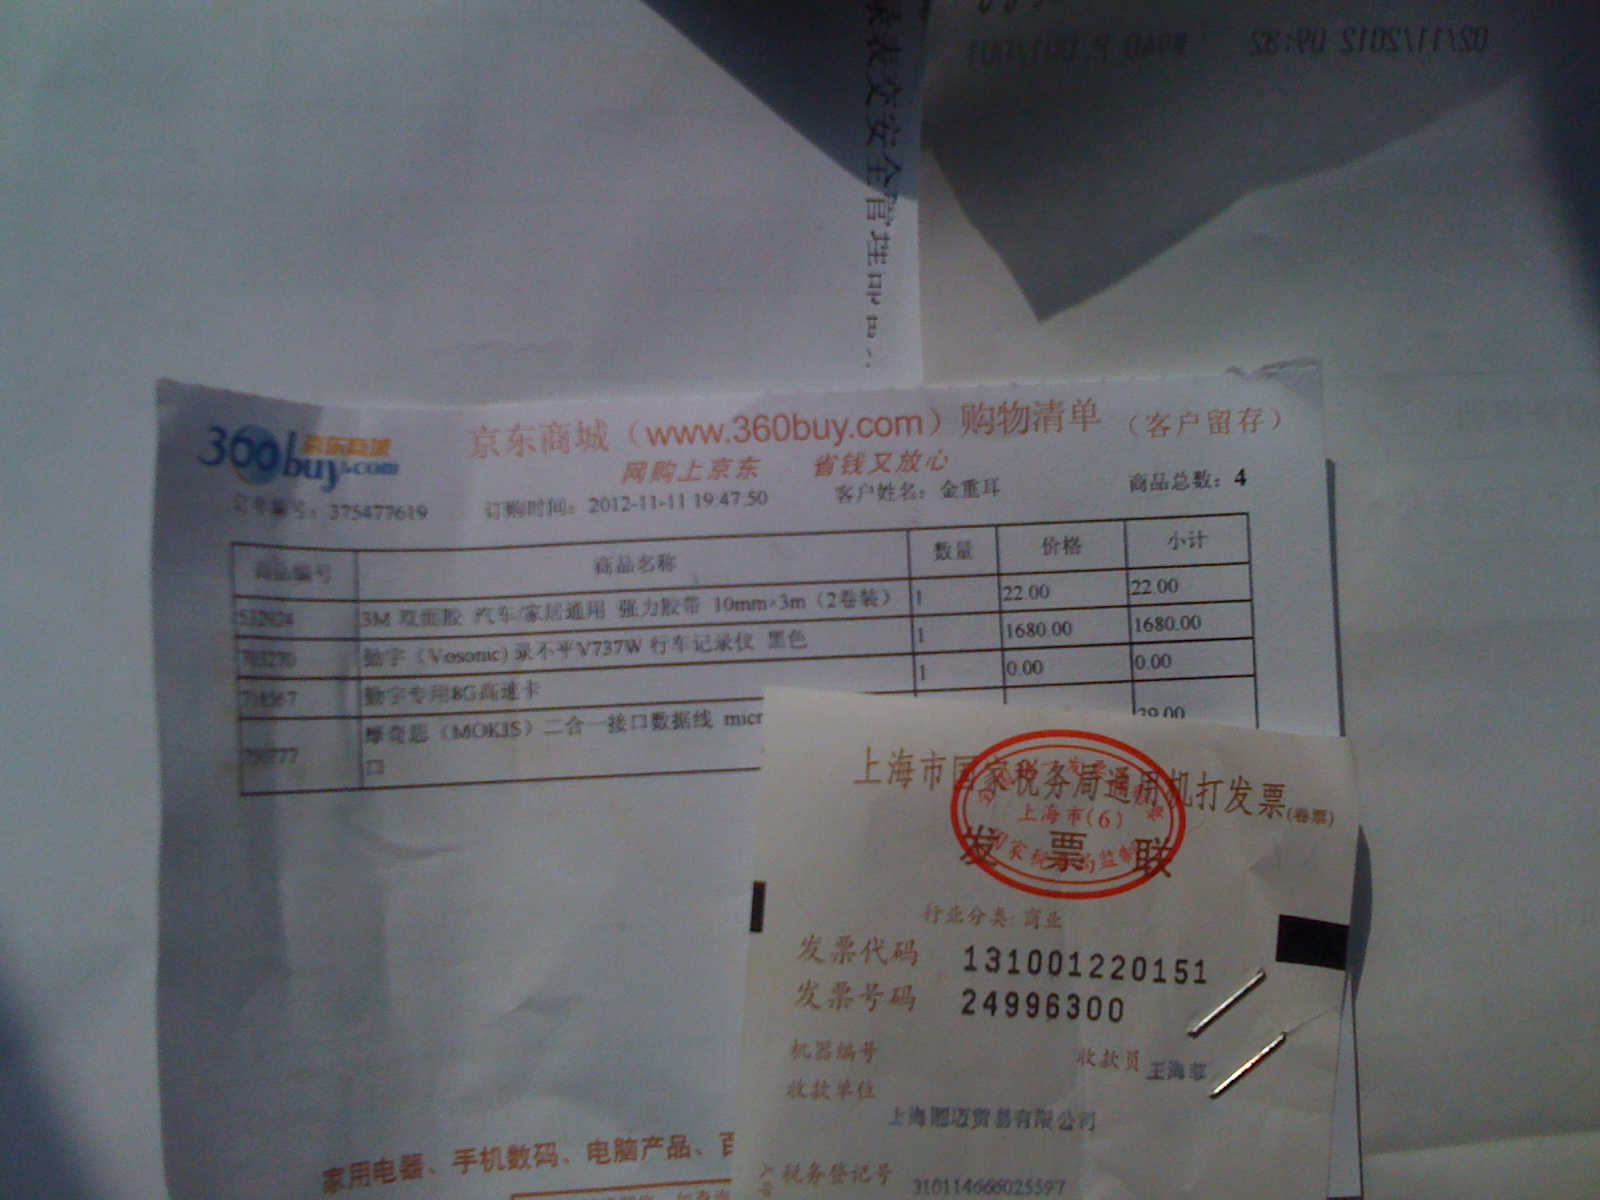 europe shop 00291998 outlet